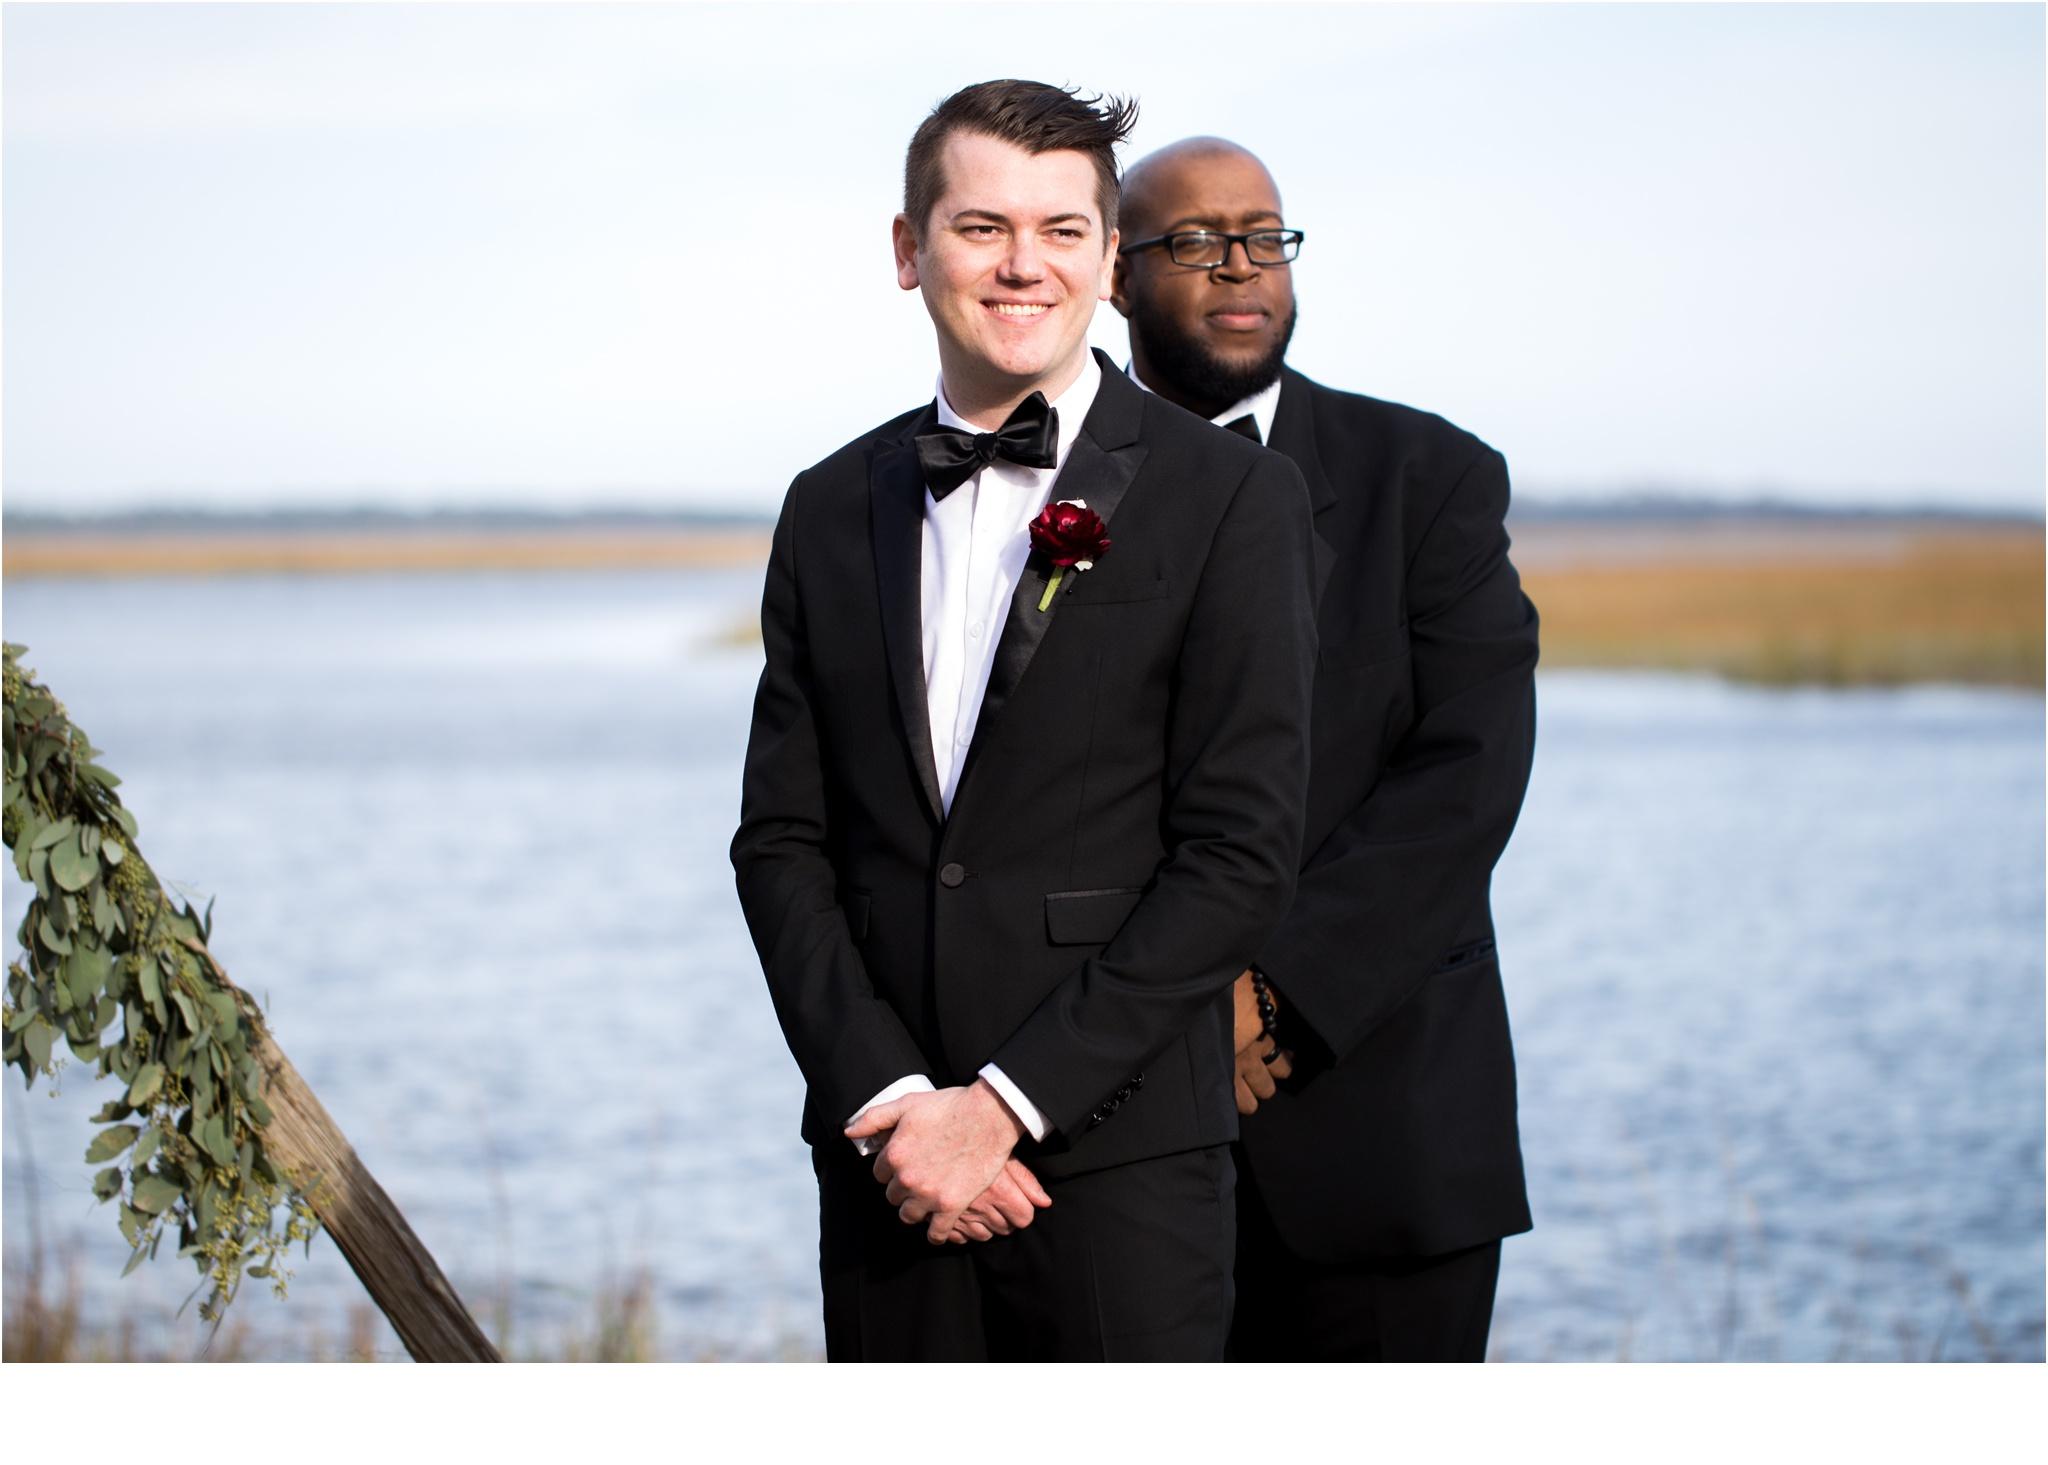 Rainey_Gregg_Photography_St._Simons_Island_Georgia_California_Wedding_Portrait_Photography_0812.jpg